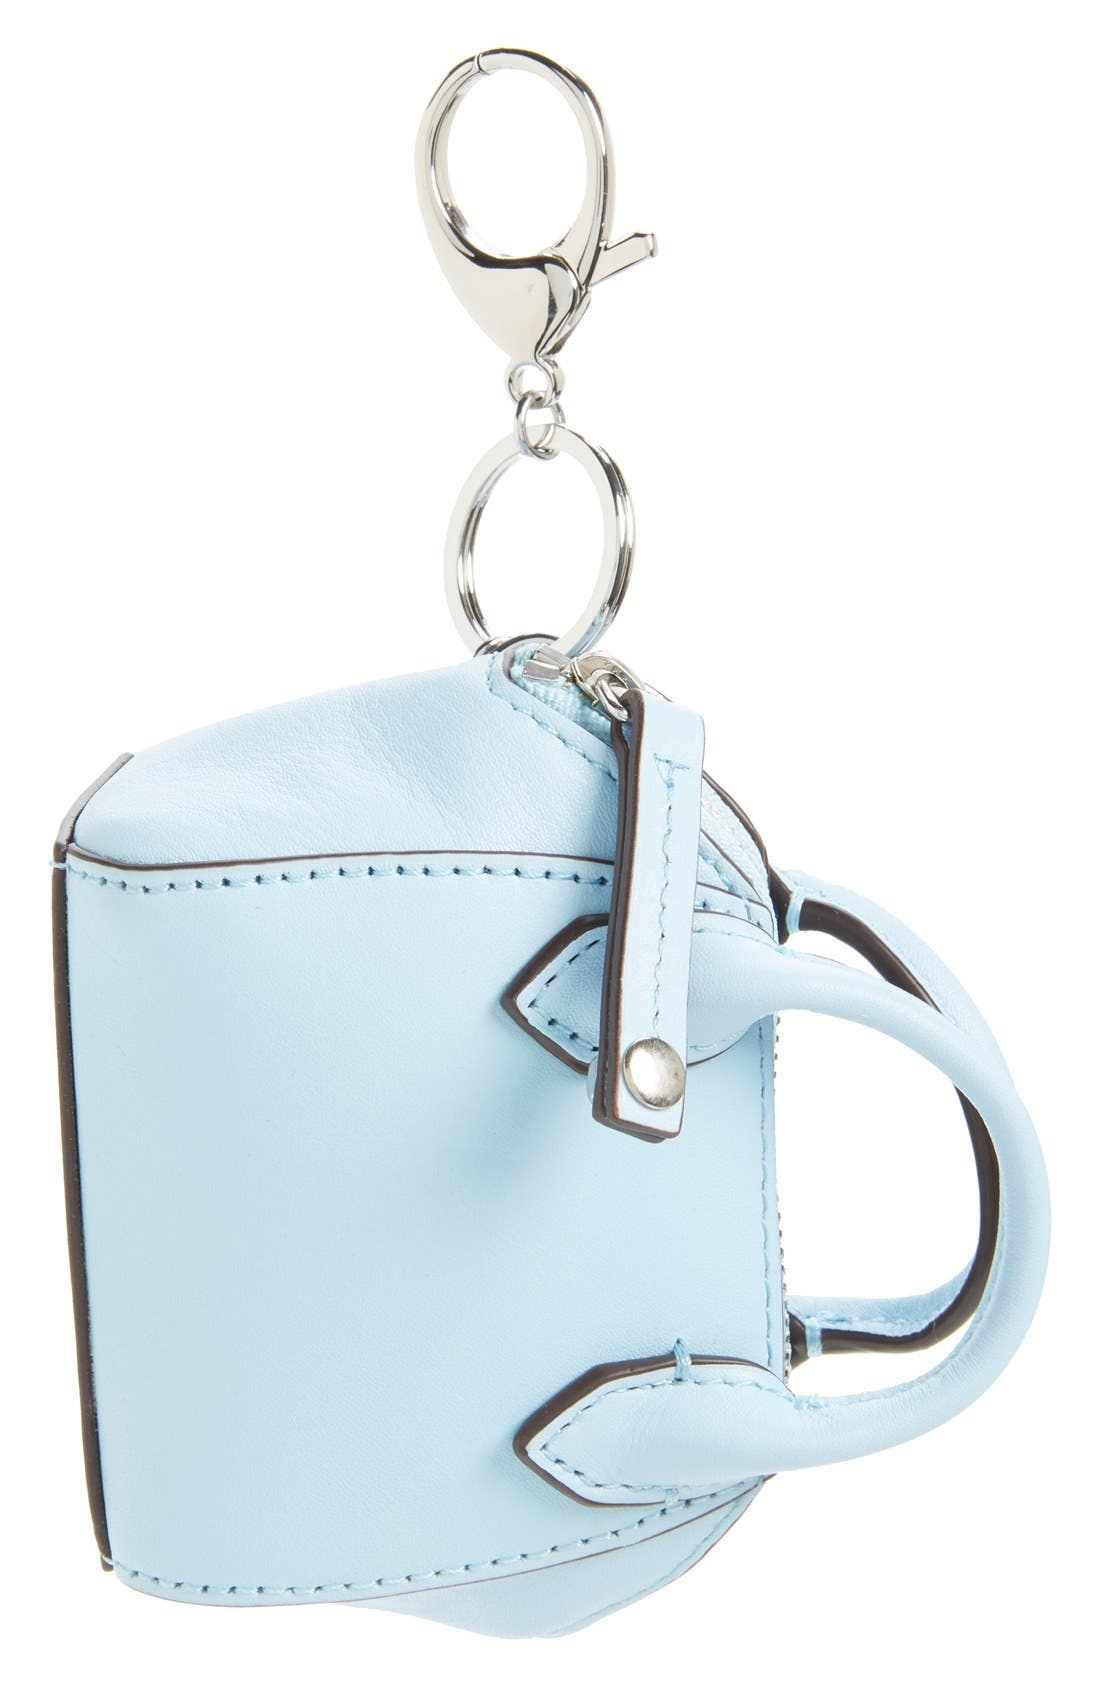 Main Image - Rebecca Minkoff 'Perry Satchel' Bag Charm